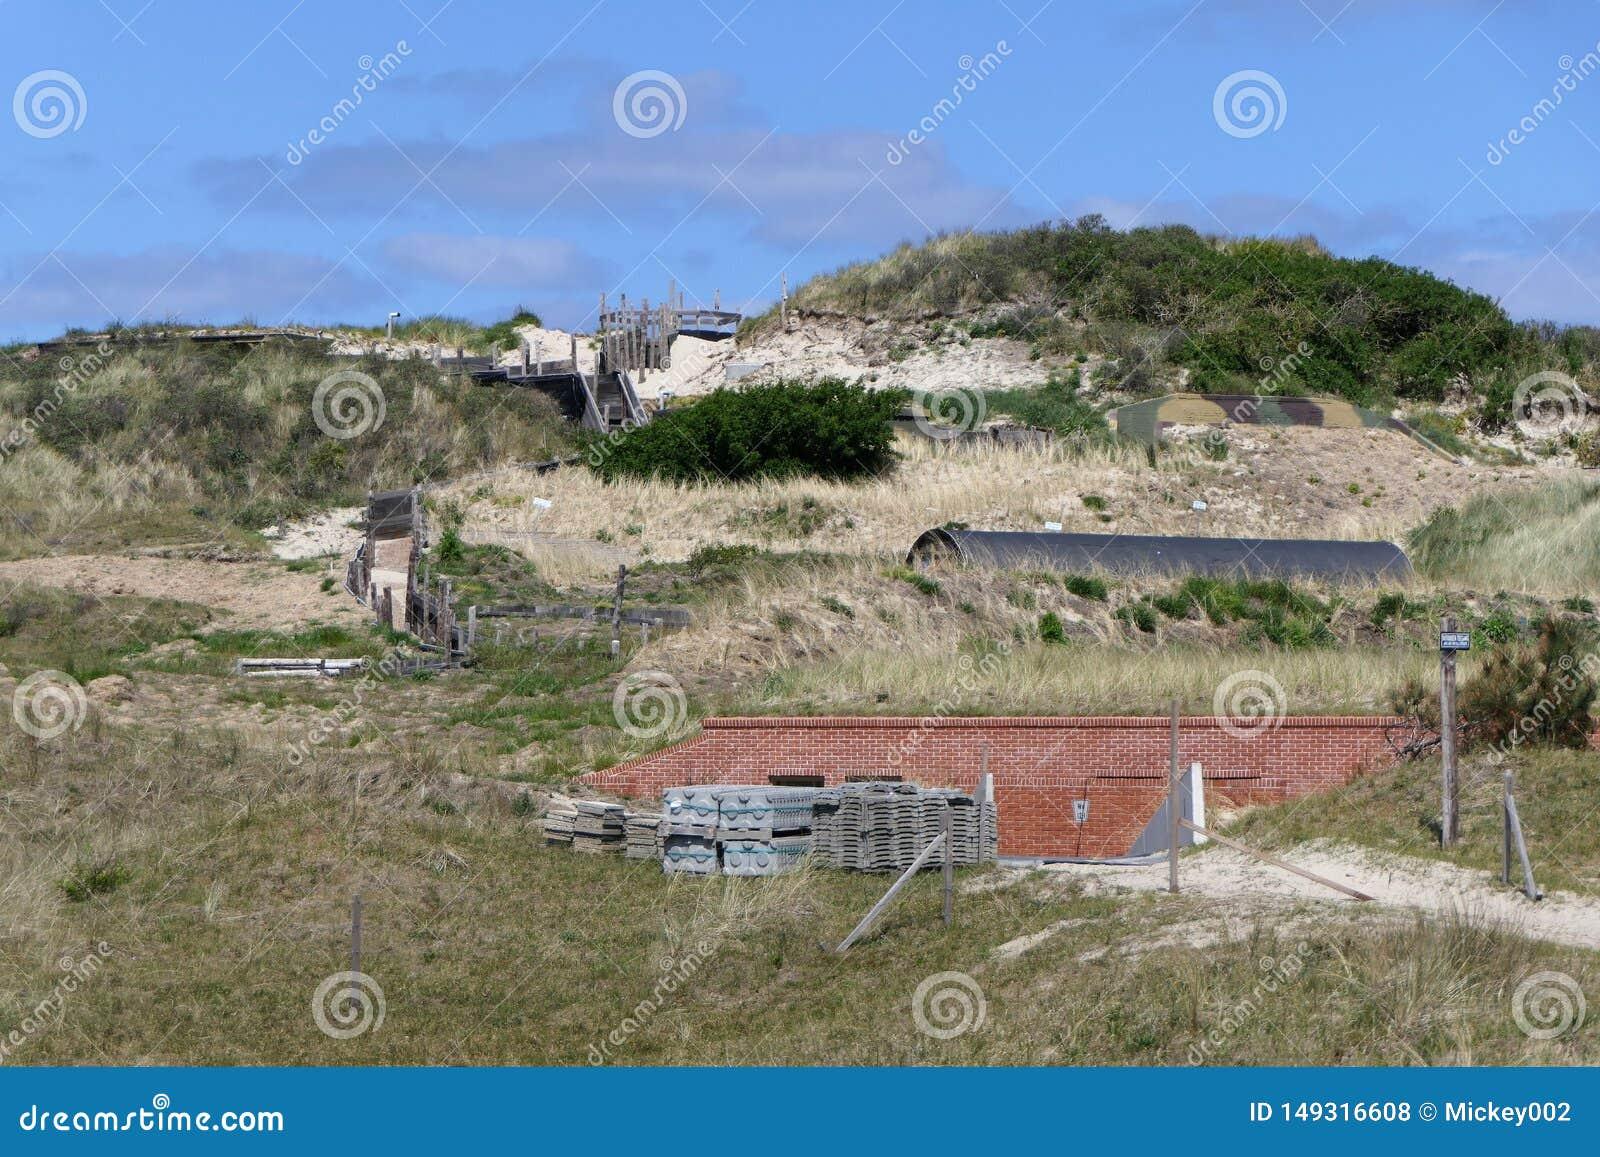 Excavation bunker Vlieland